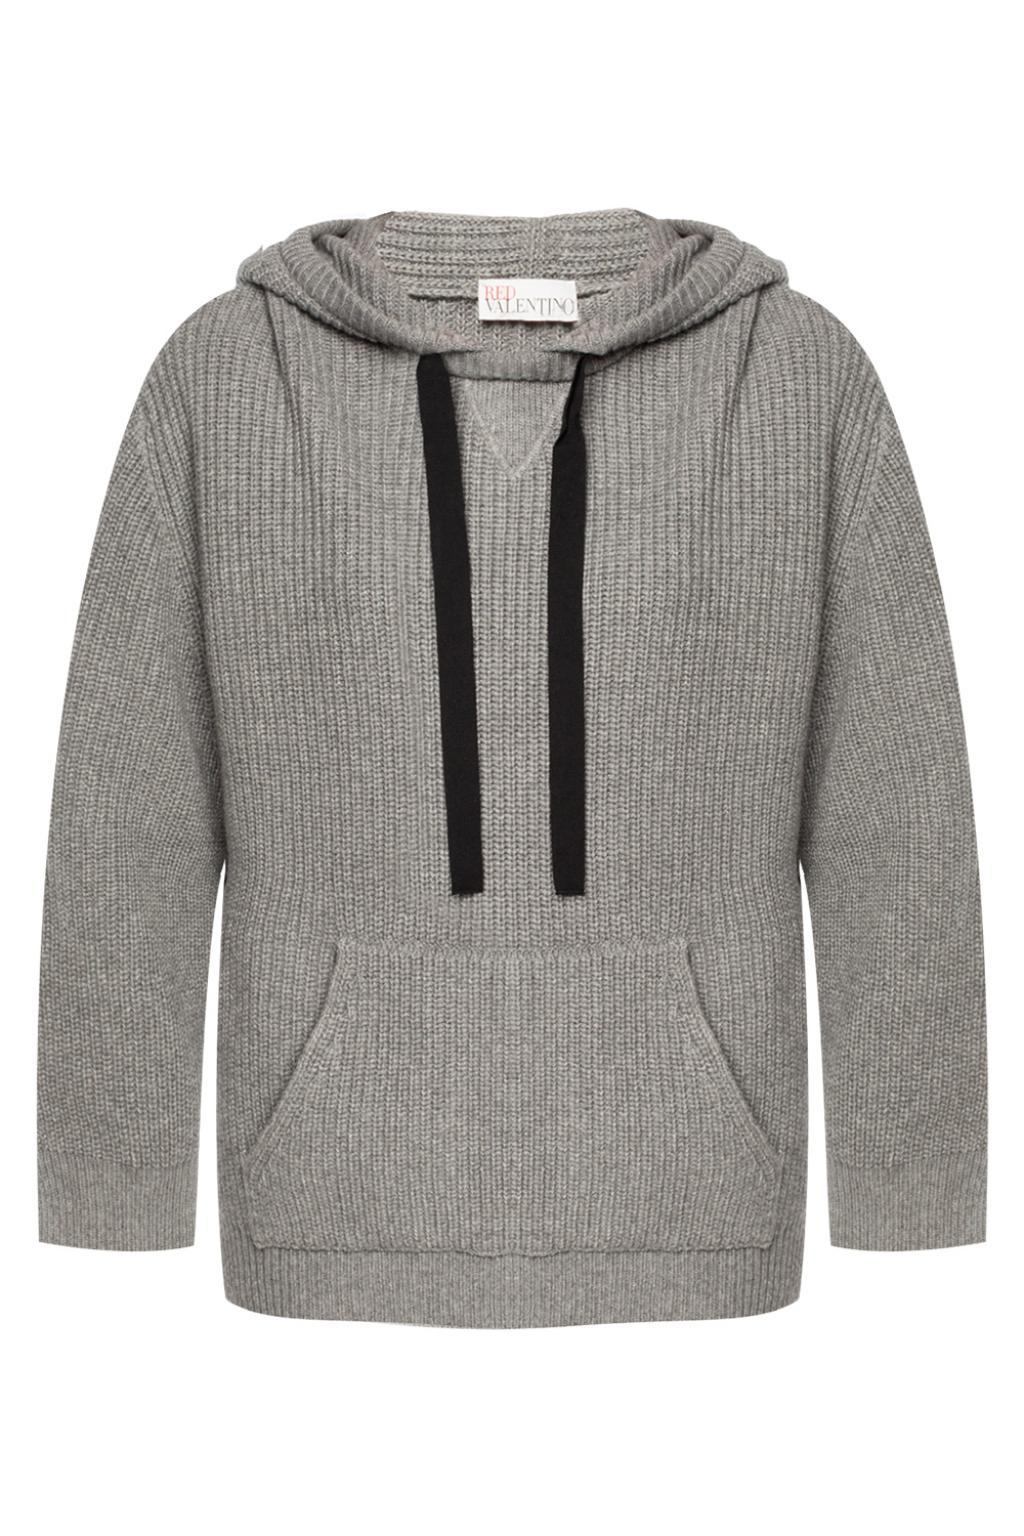 RED Valentino. Women's Gray Embroidered Sweatshirt